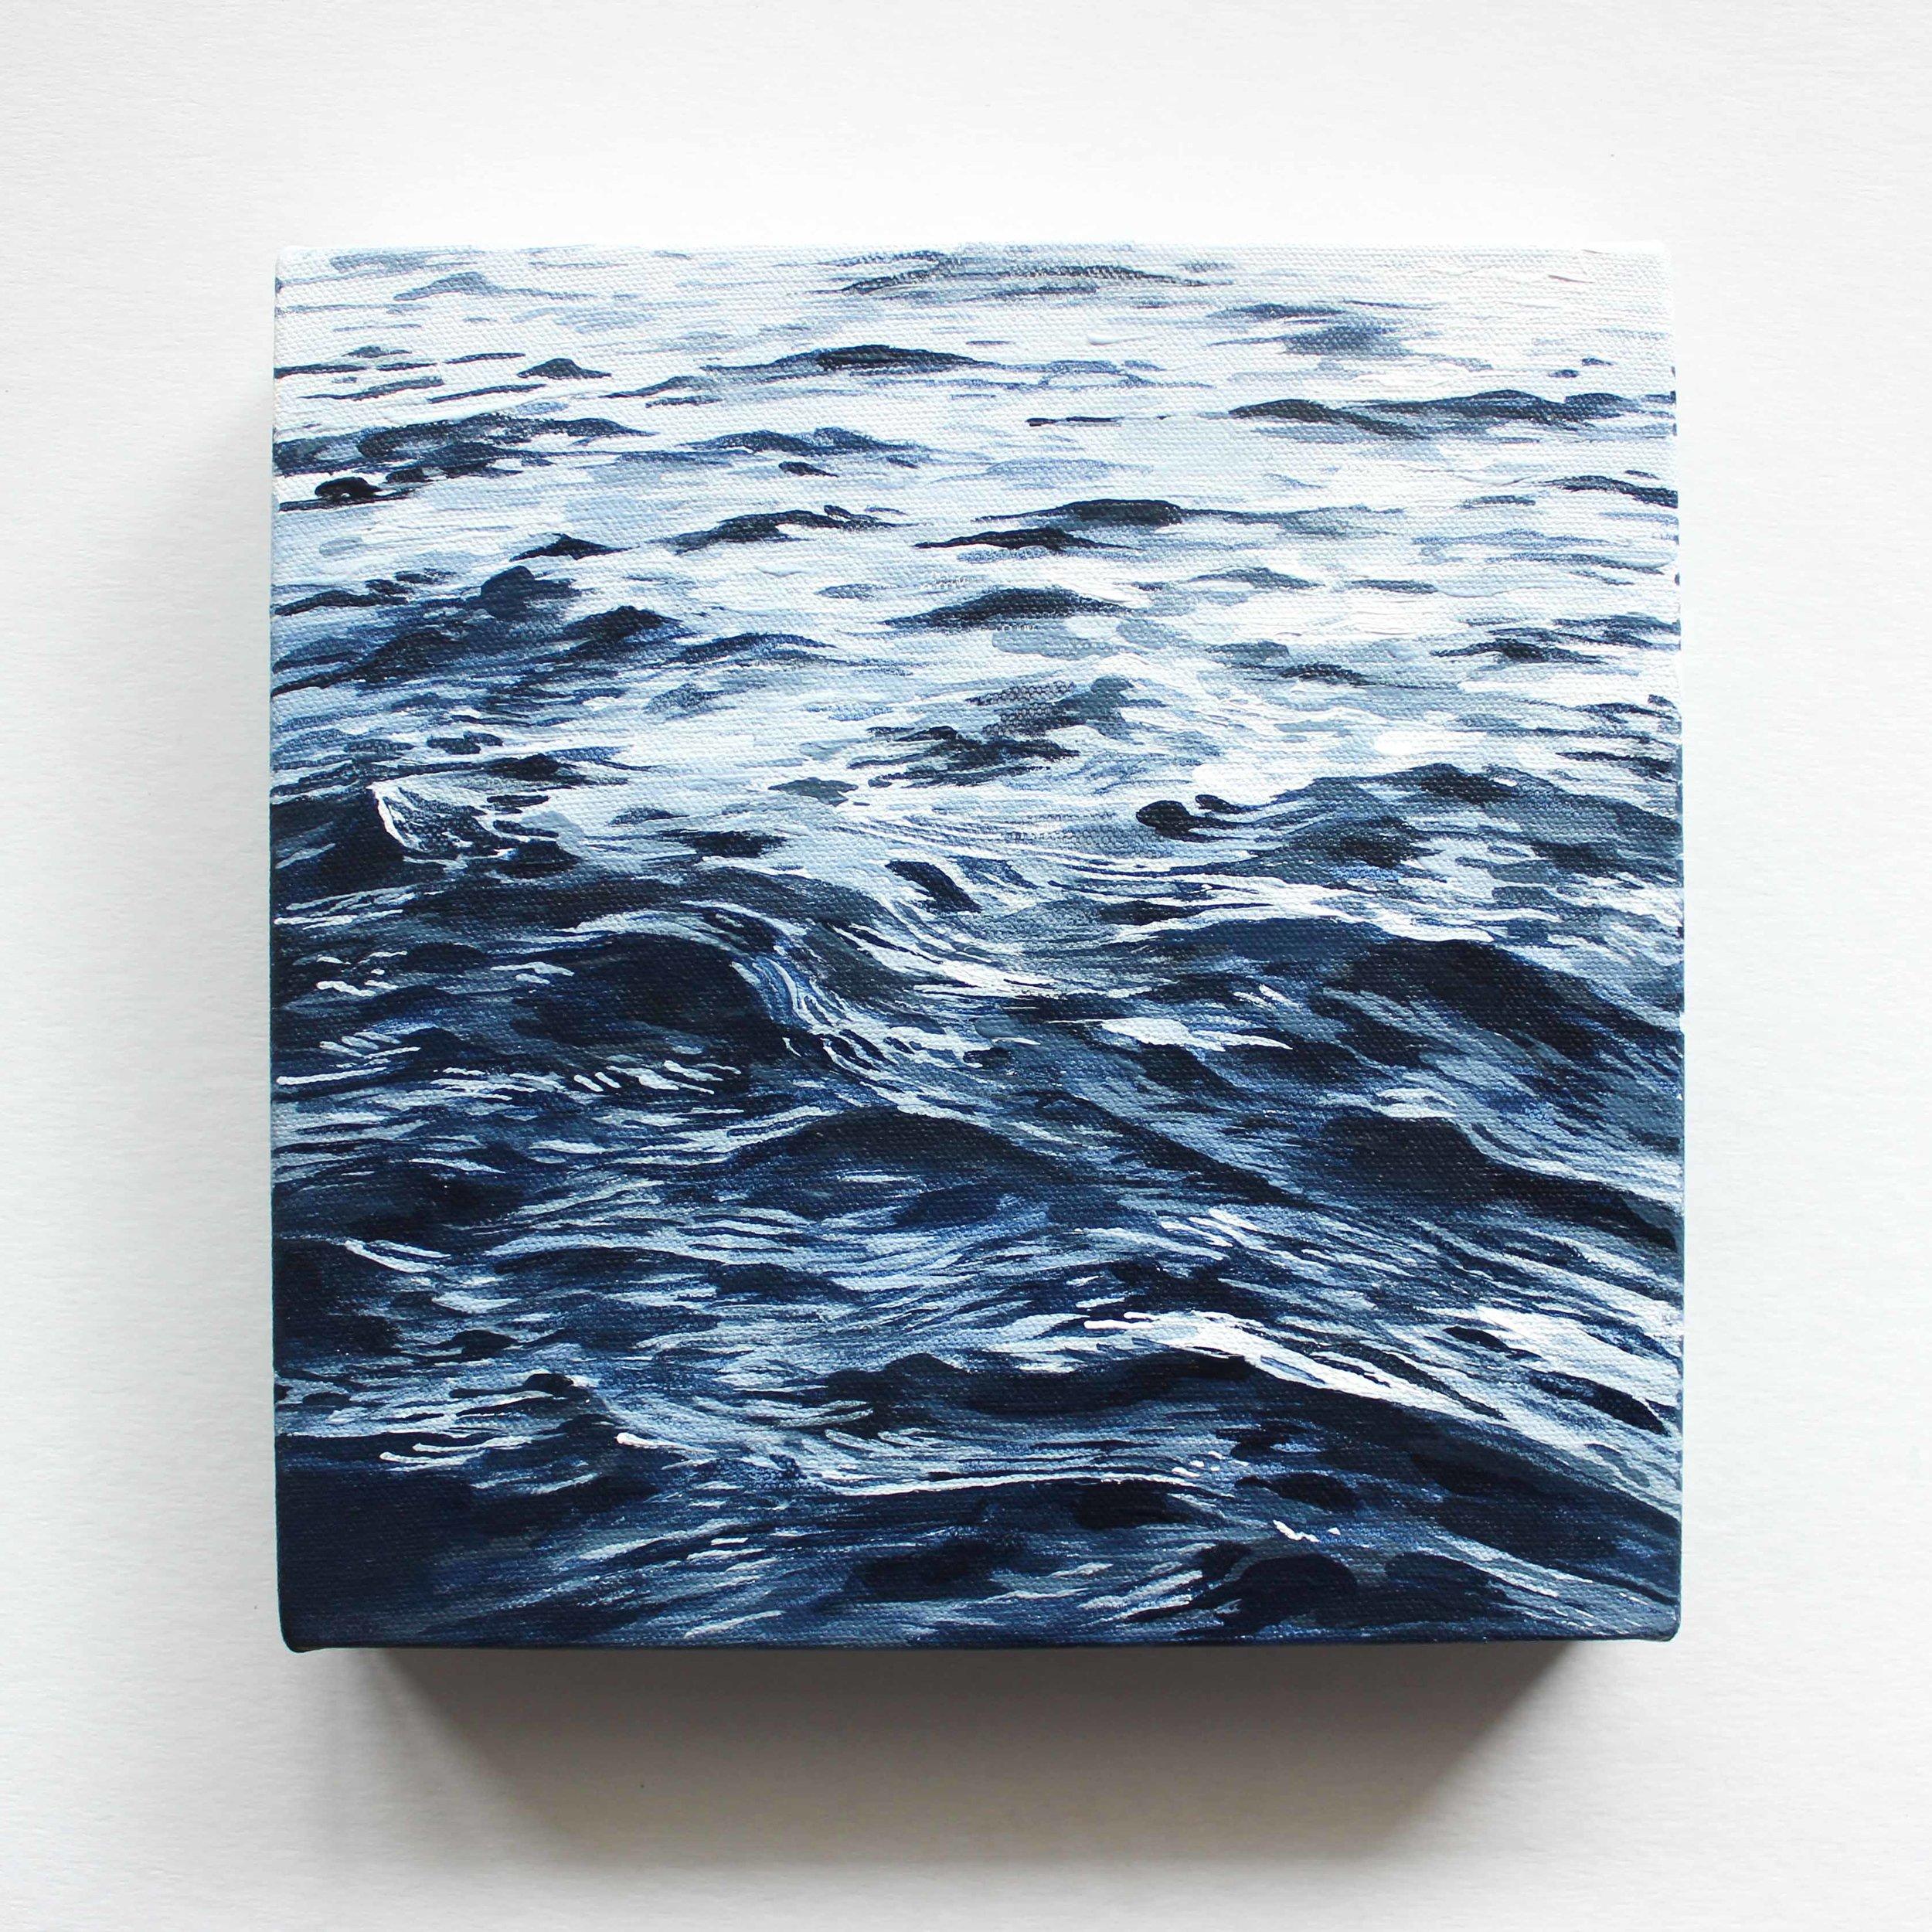 Navy Lake 2 10x10.jpg